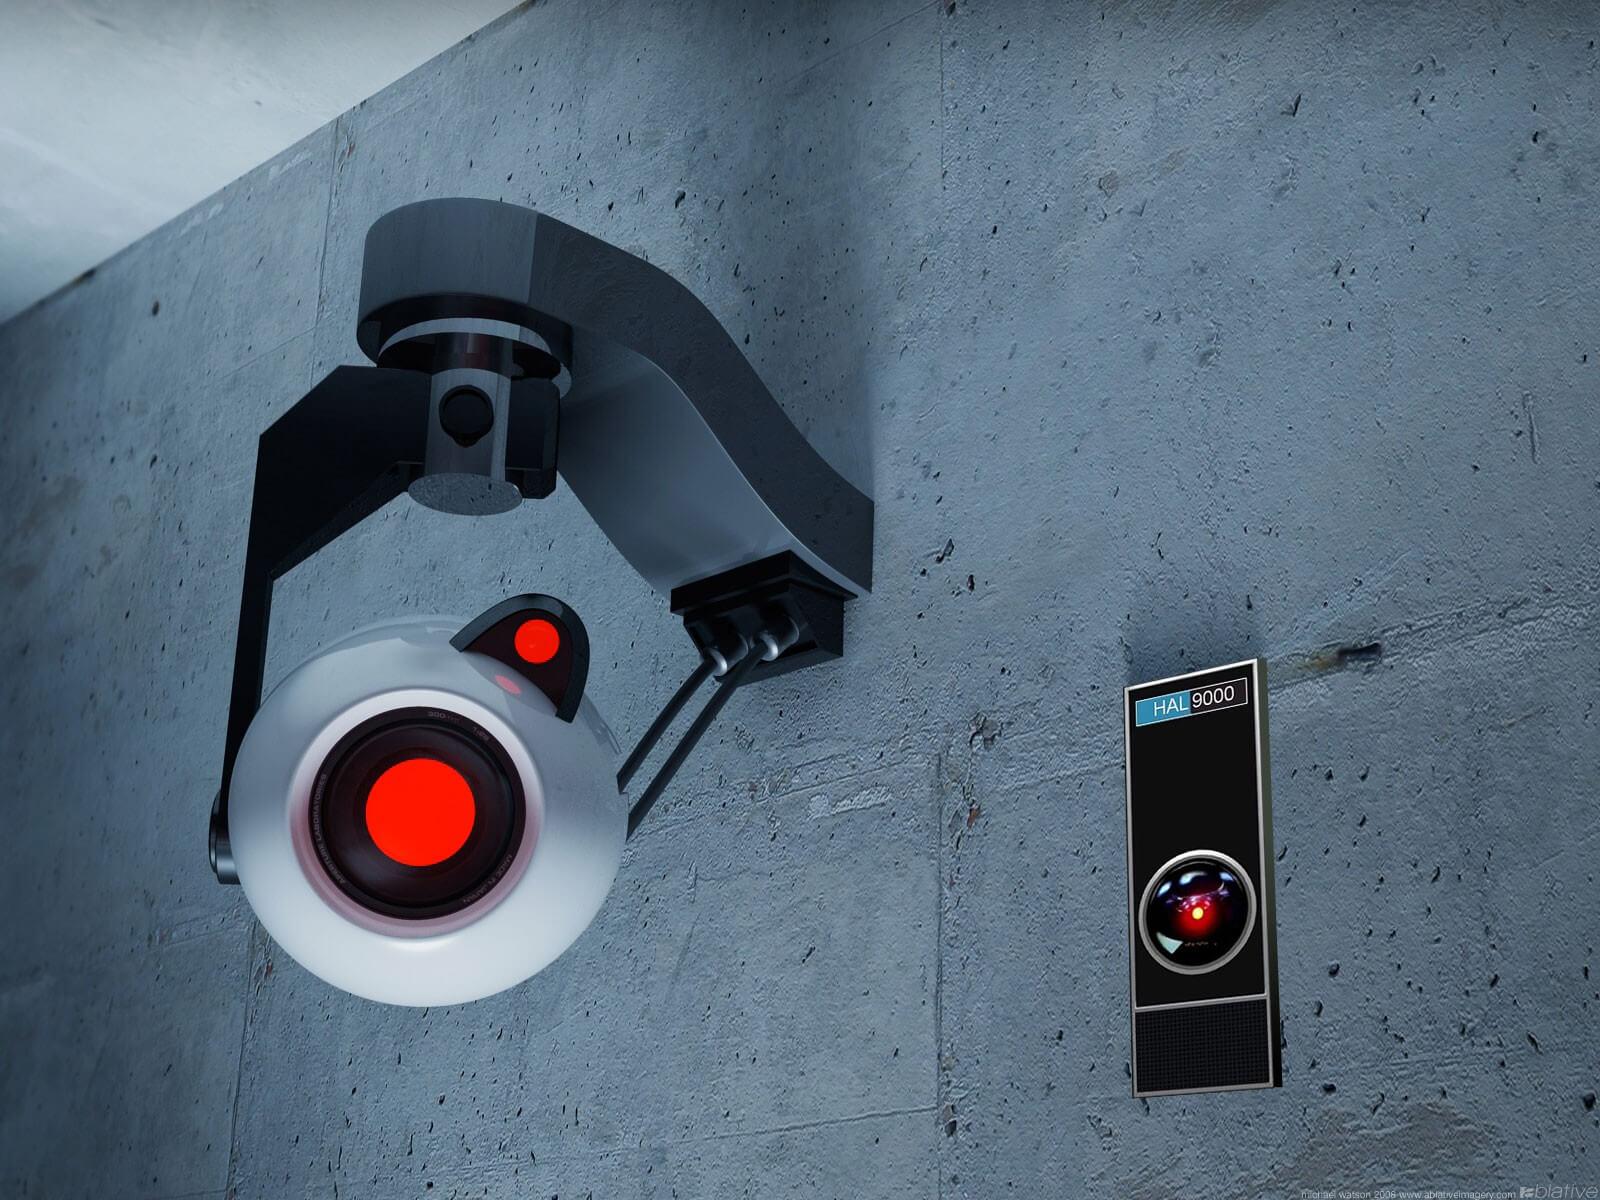 слежка за человеком